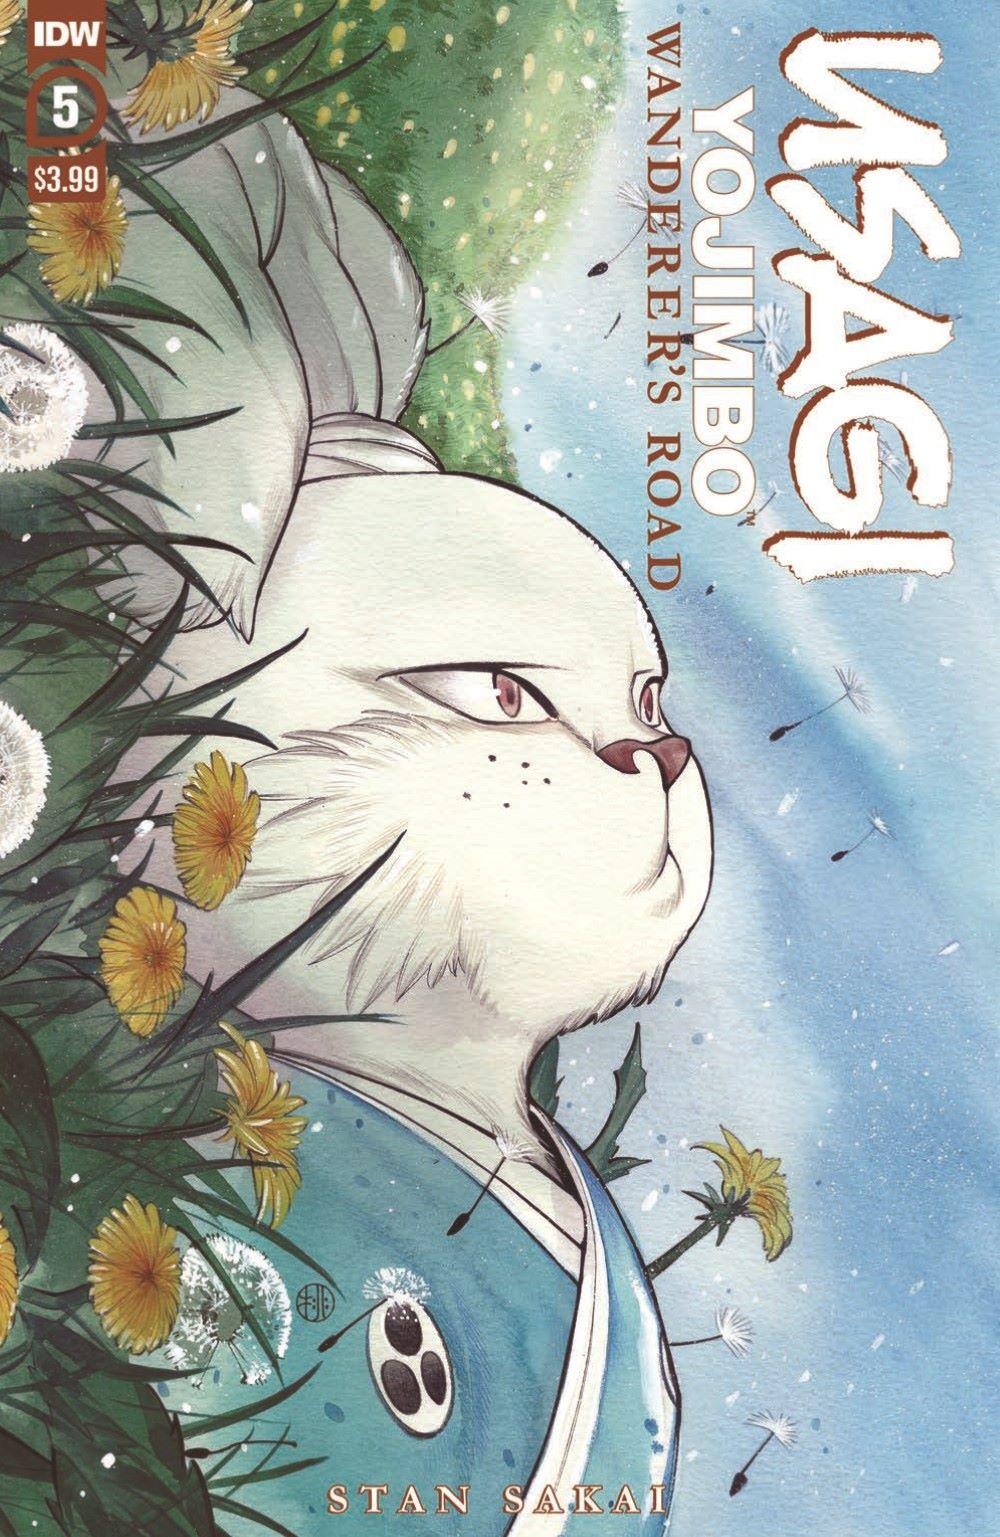 Usagi-WR05_pr-1 ComicList Previews: USAGI YOJIMBO WANDERER'S ROAD #5 (OF 6)